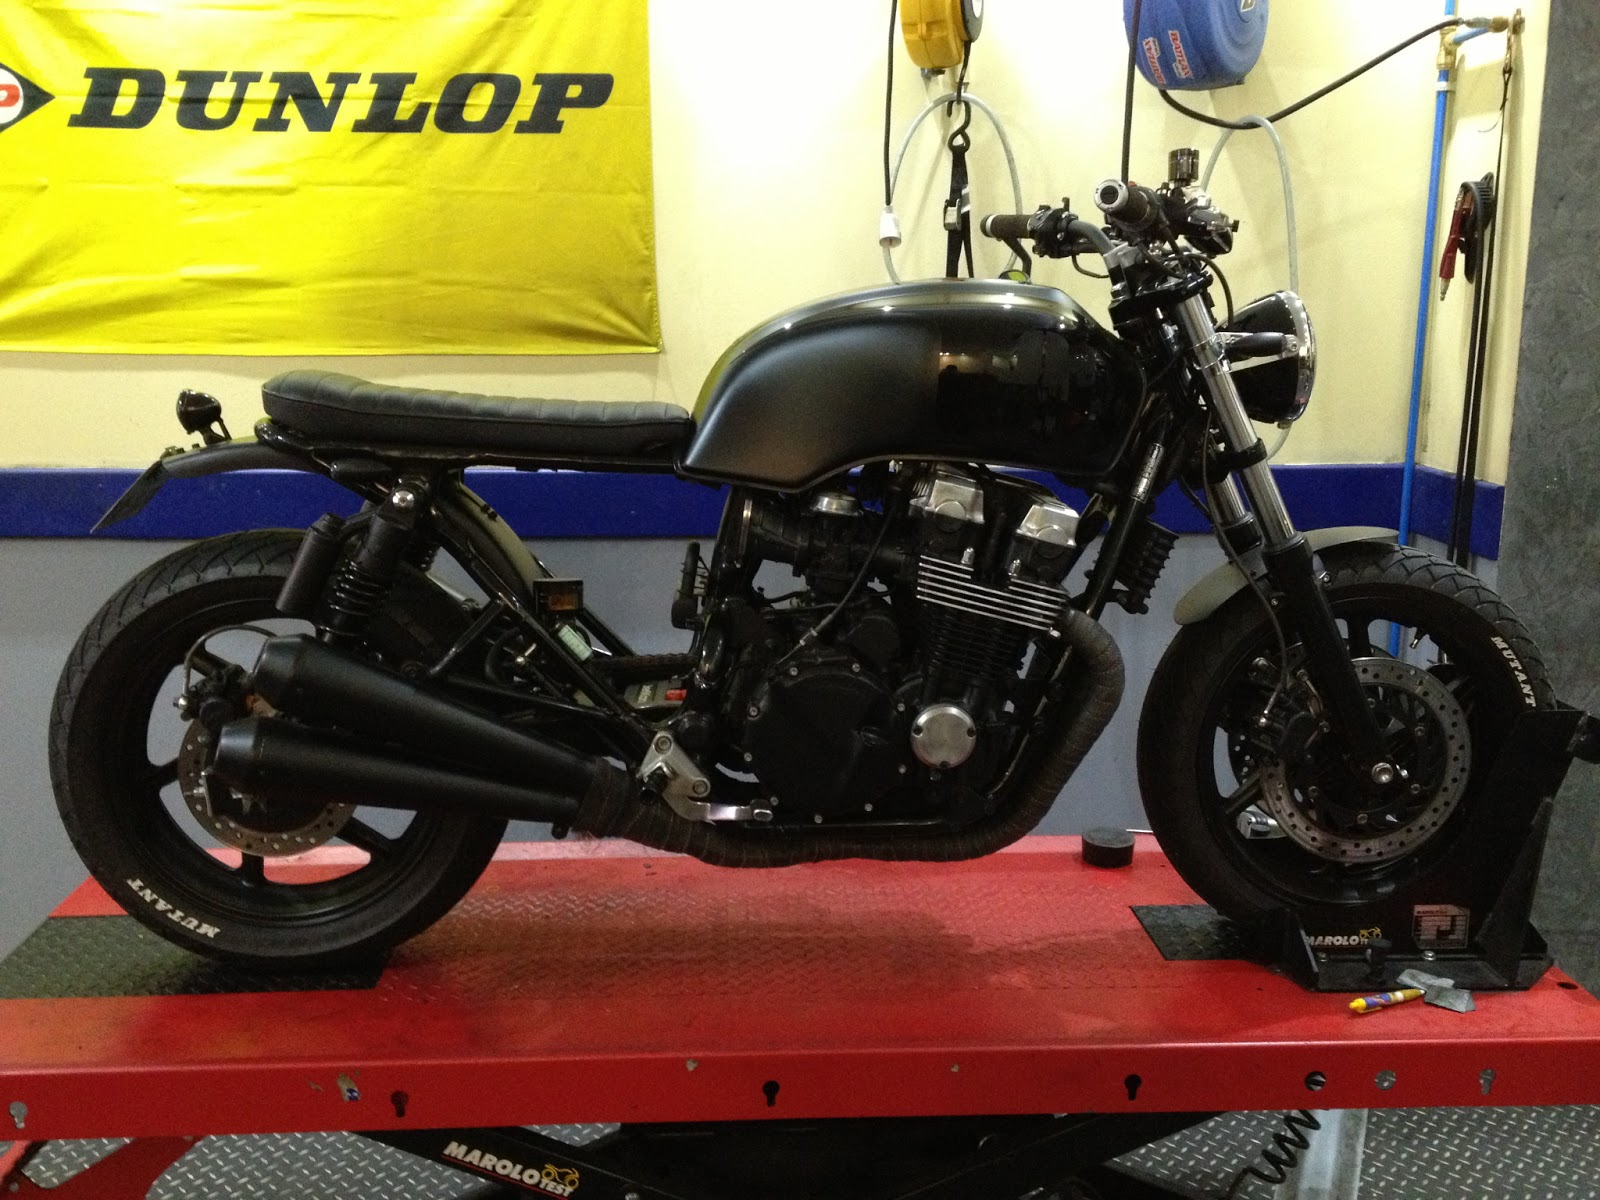 jerikan motorcycles 5 honda cb 750 seven fifty. Black Bedroom Furniture Sets. Home Design Ideas